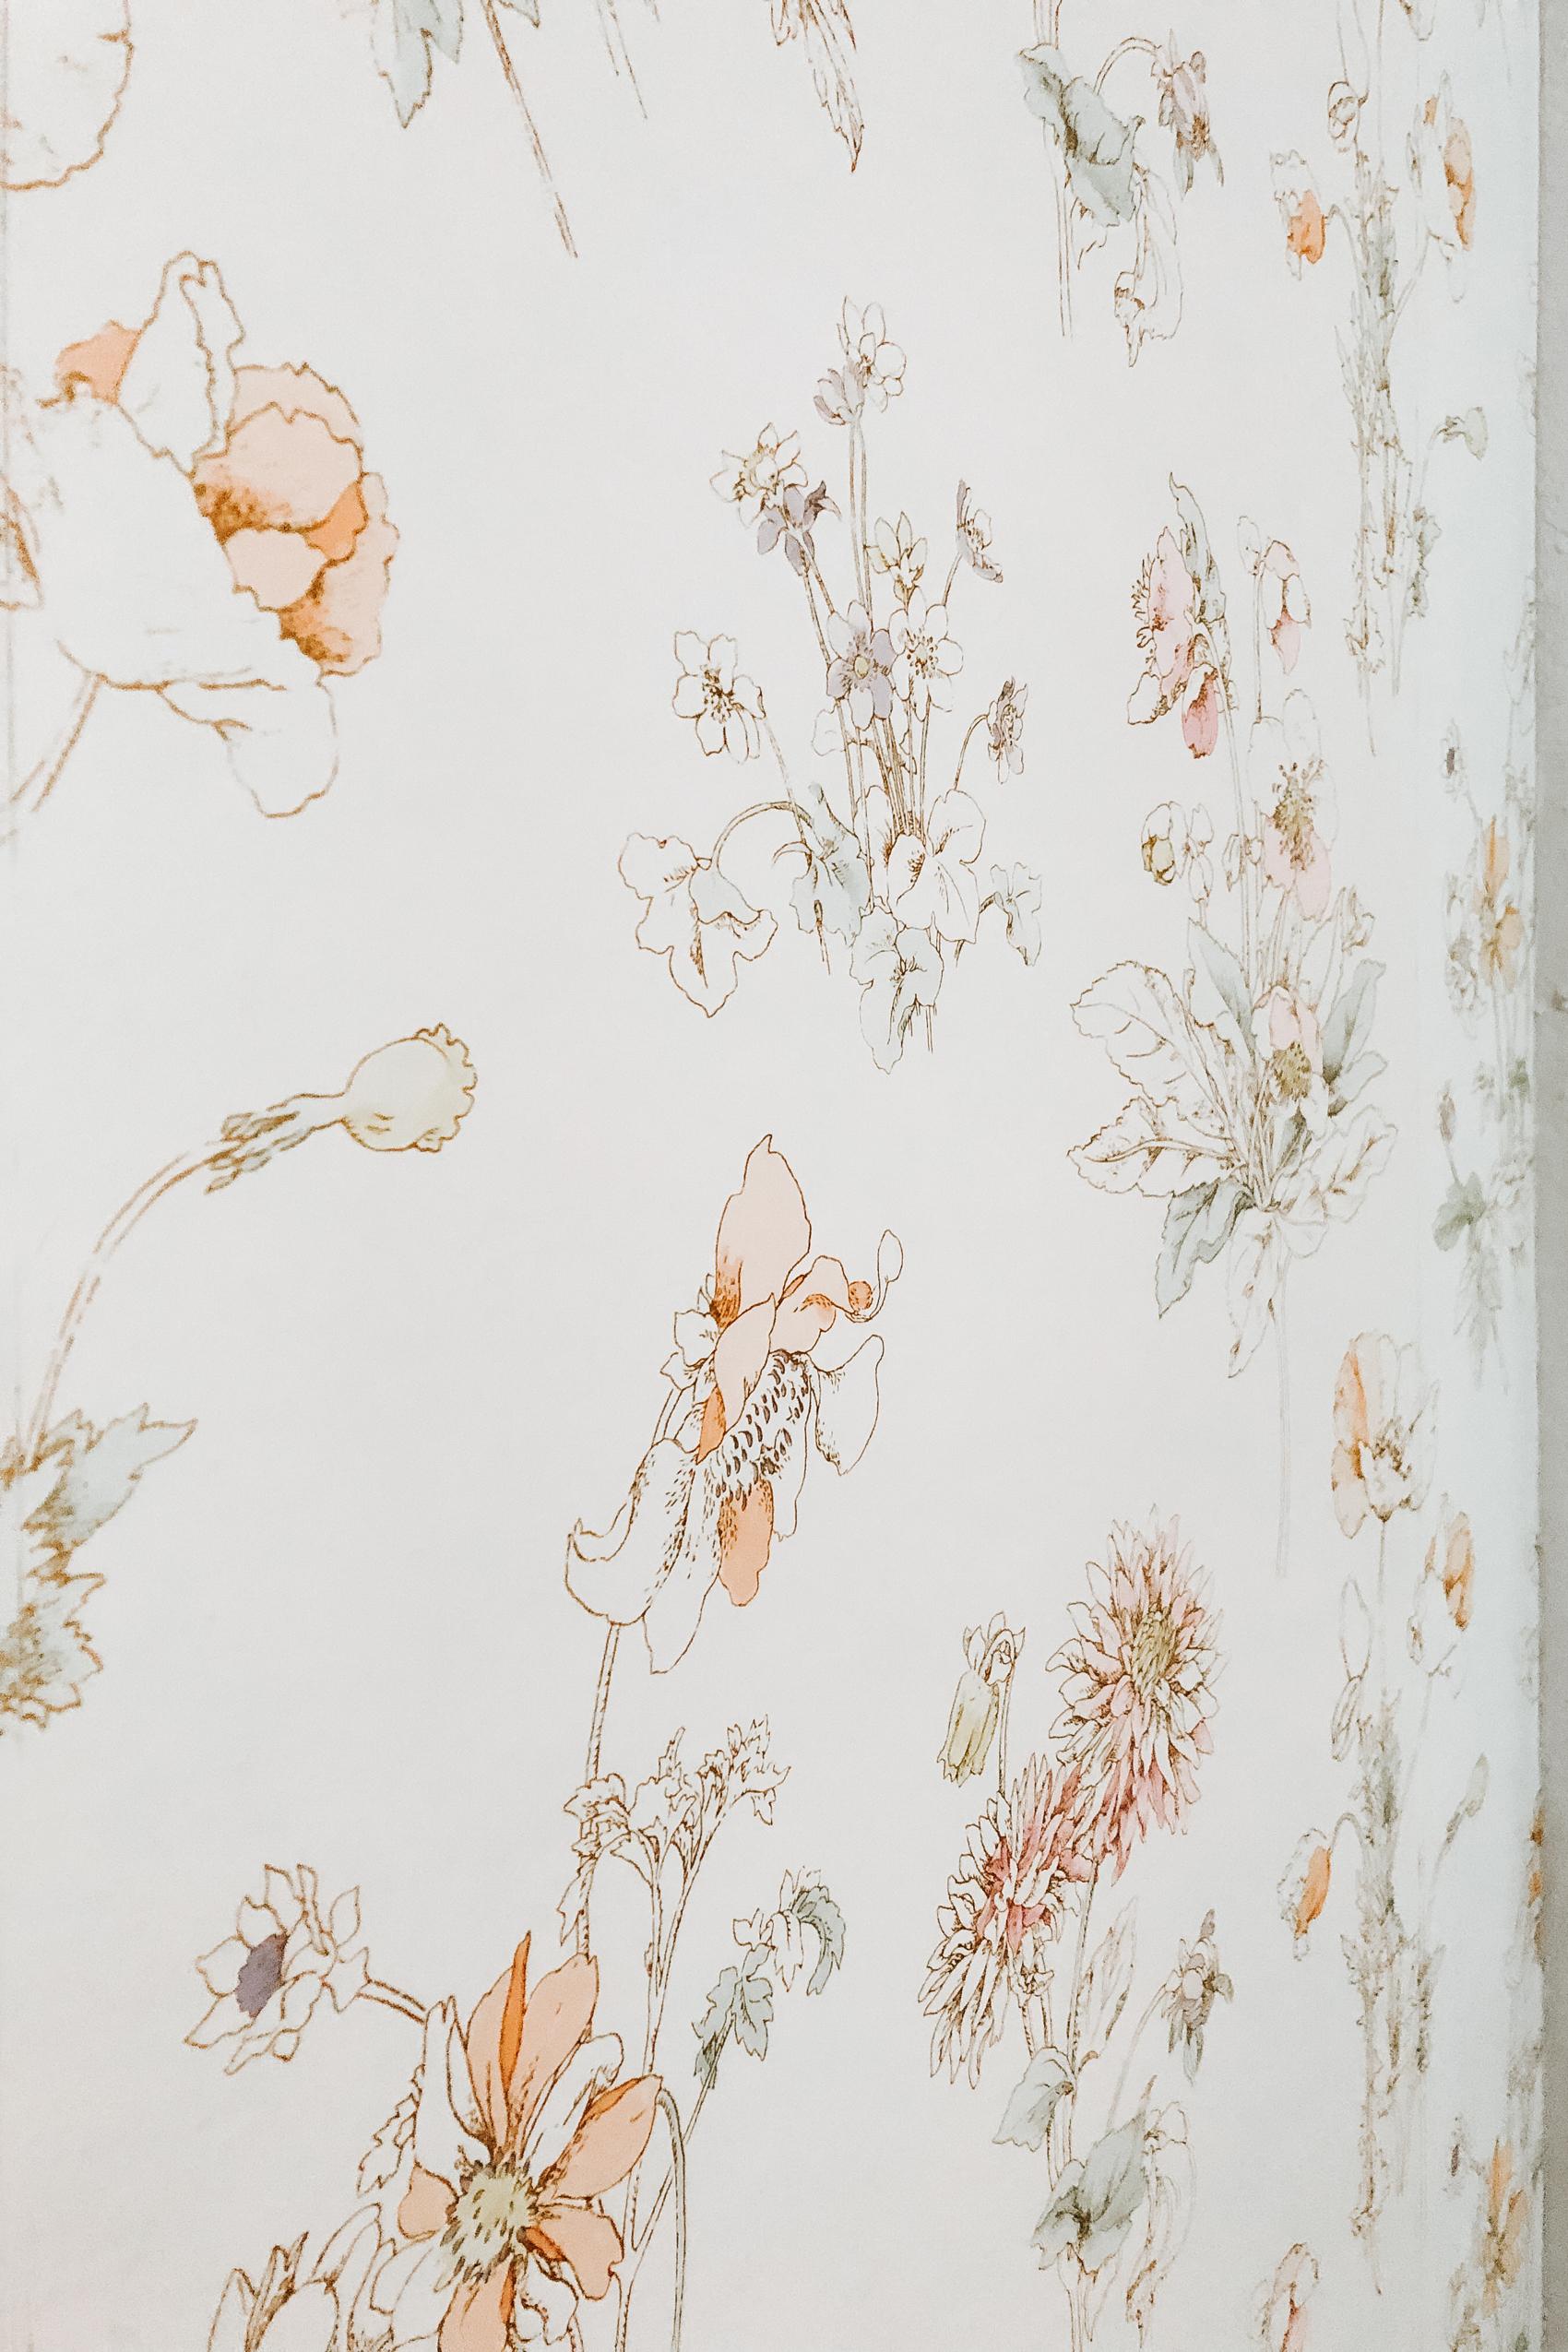 Nursery Closet Reveal with Rubbermaid via. The Pacific Standard   www.thepacificstandard.com #nurserytour #nurseryidea #nurserywallpaper